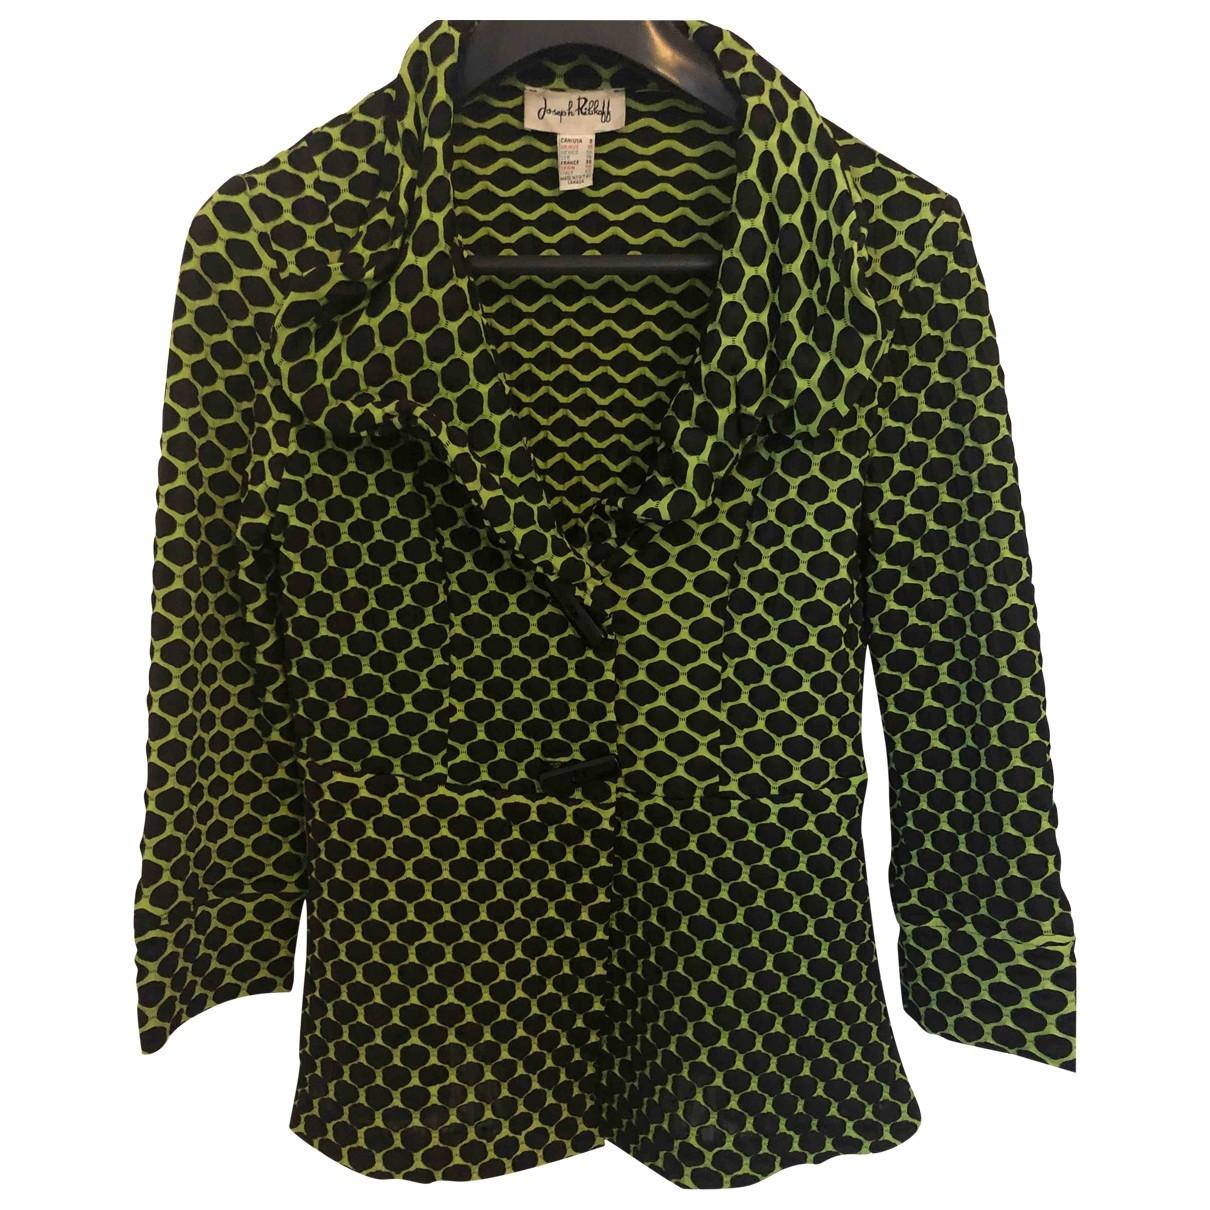 Joseph Ribkoff \N Jacke in  Gruen Polyester